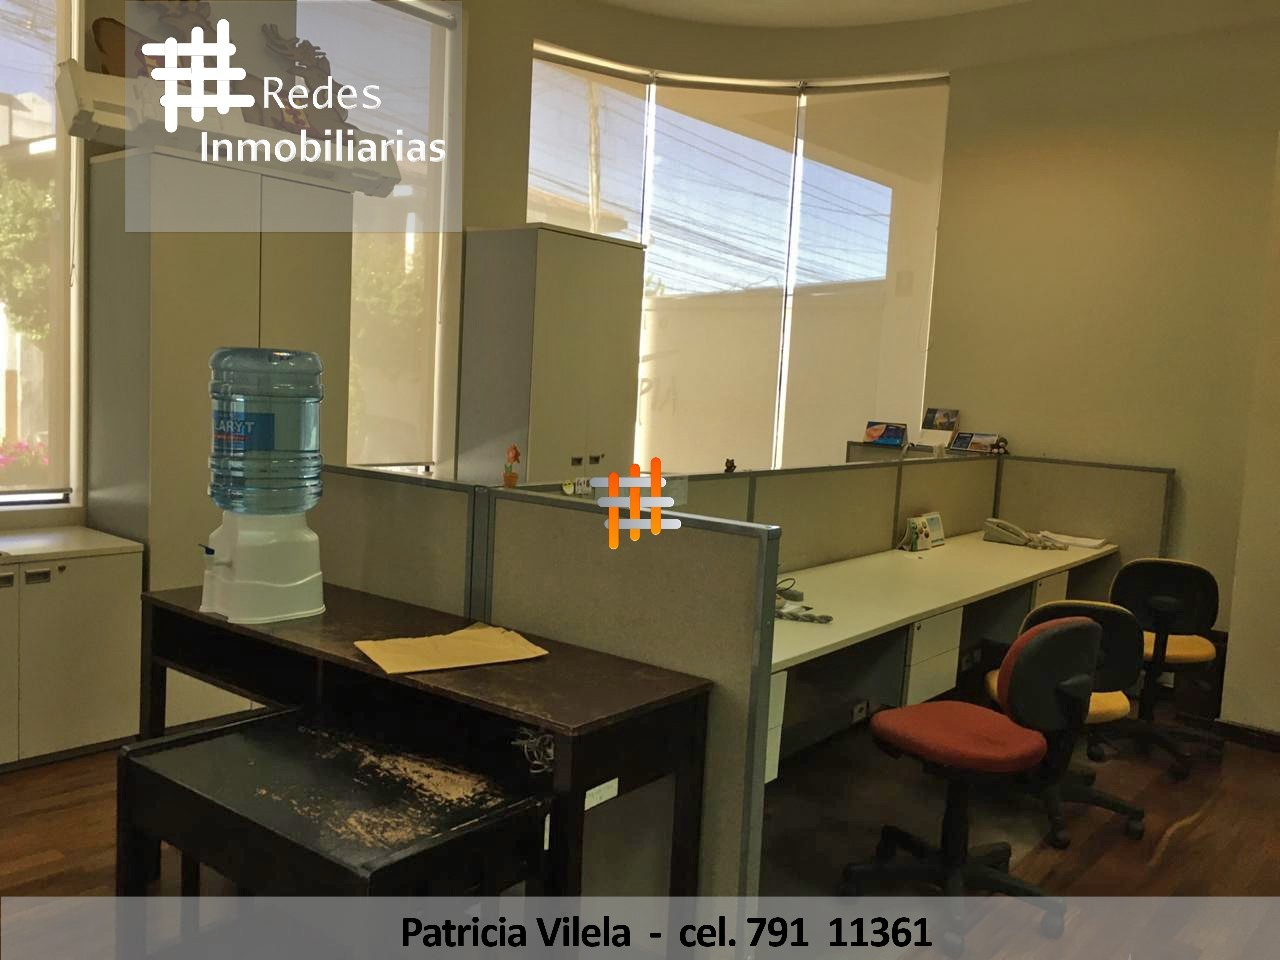 Oficina en Alquiler FICINA SOPOCACHI EN VENTA O ALQULER CON OPCION A SER AMOBLADA Foto 33